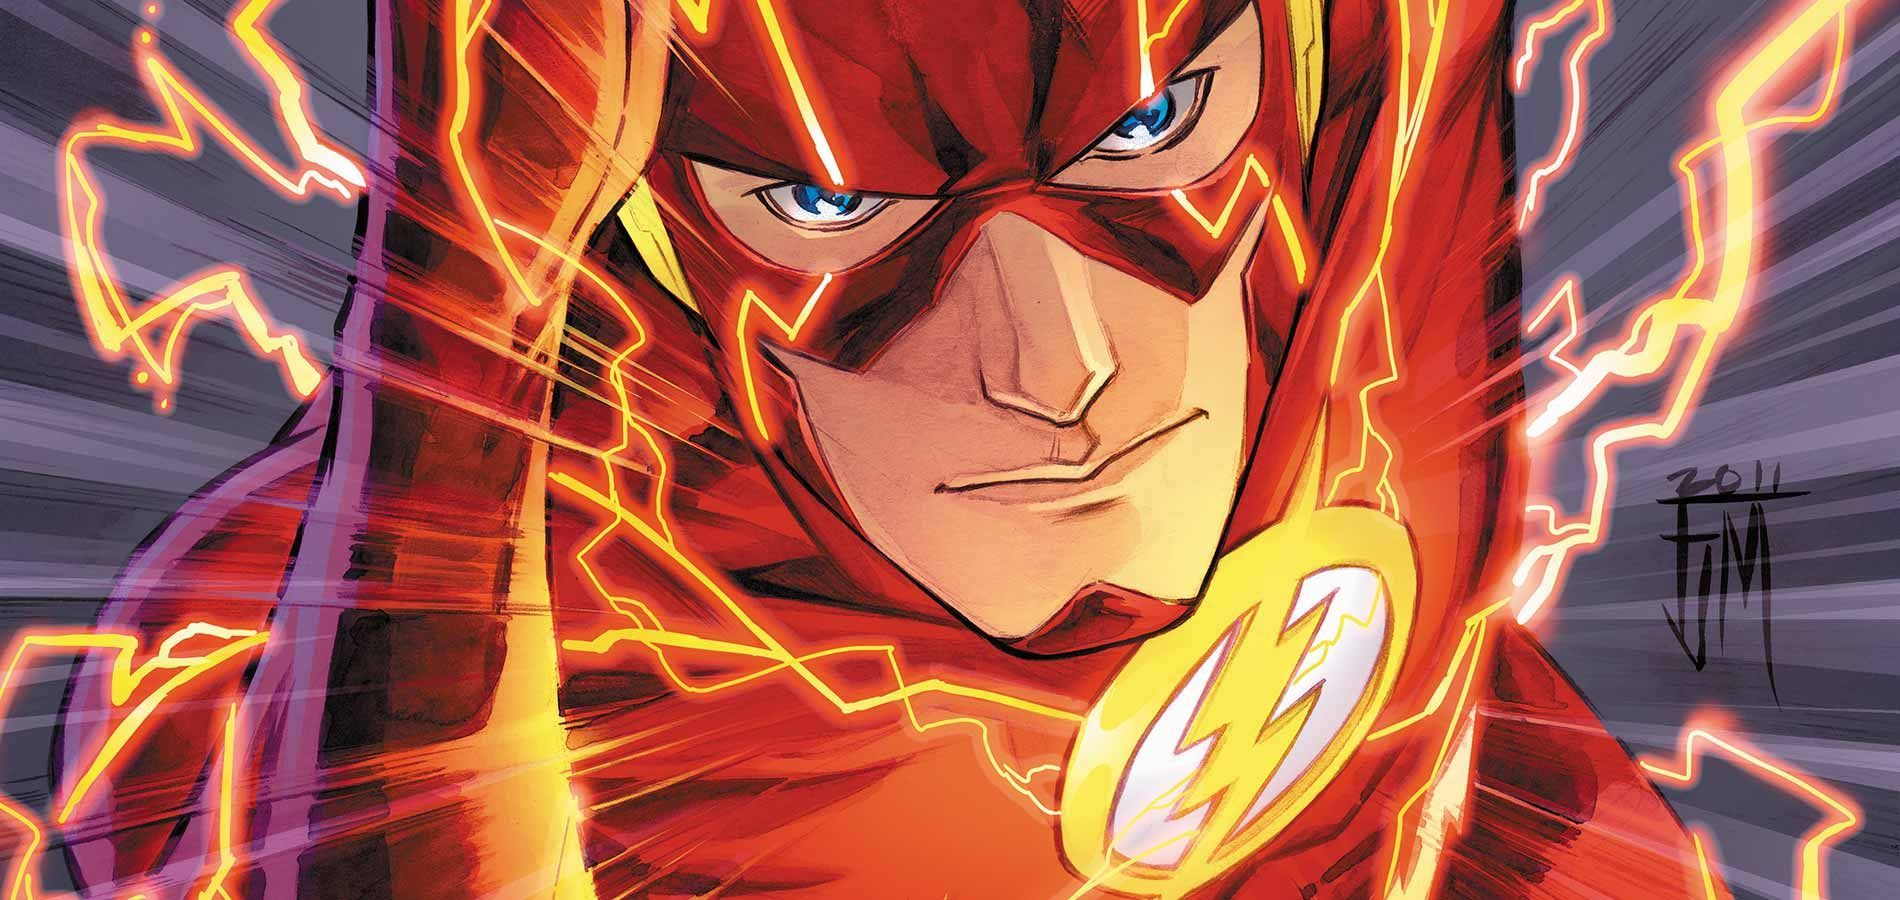 ¿Cuál es el nombre del primer Flash?